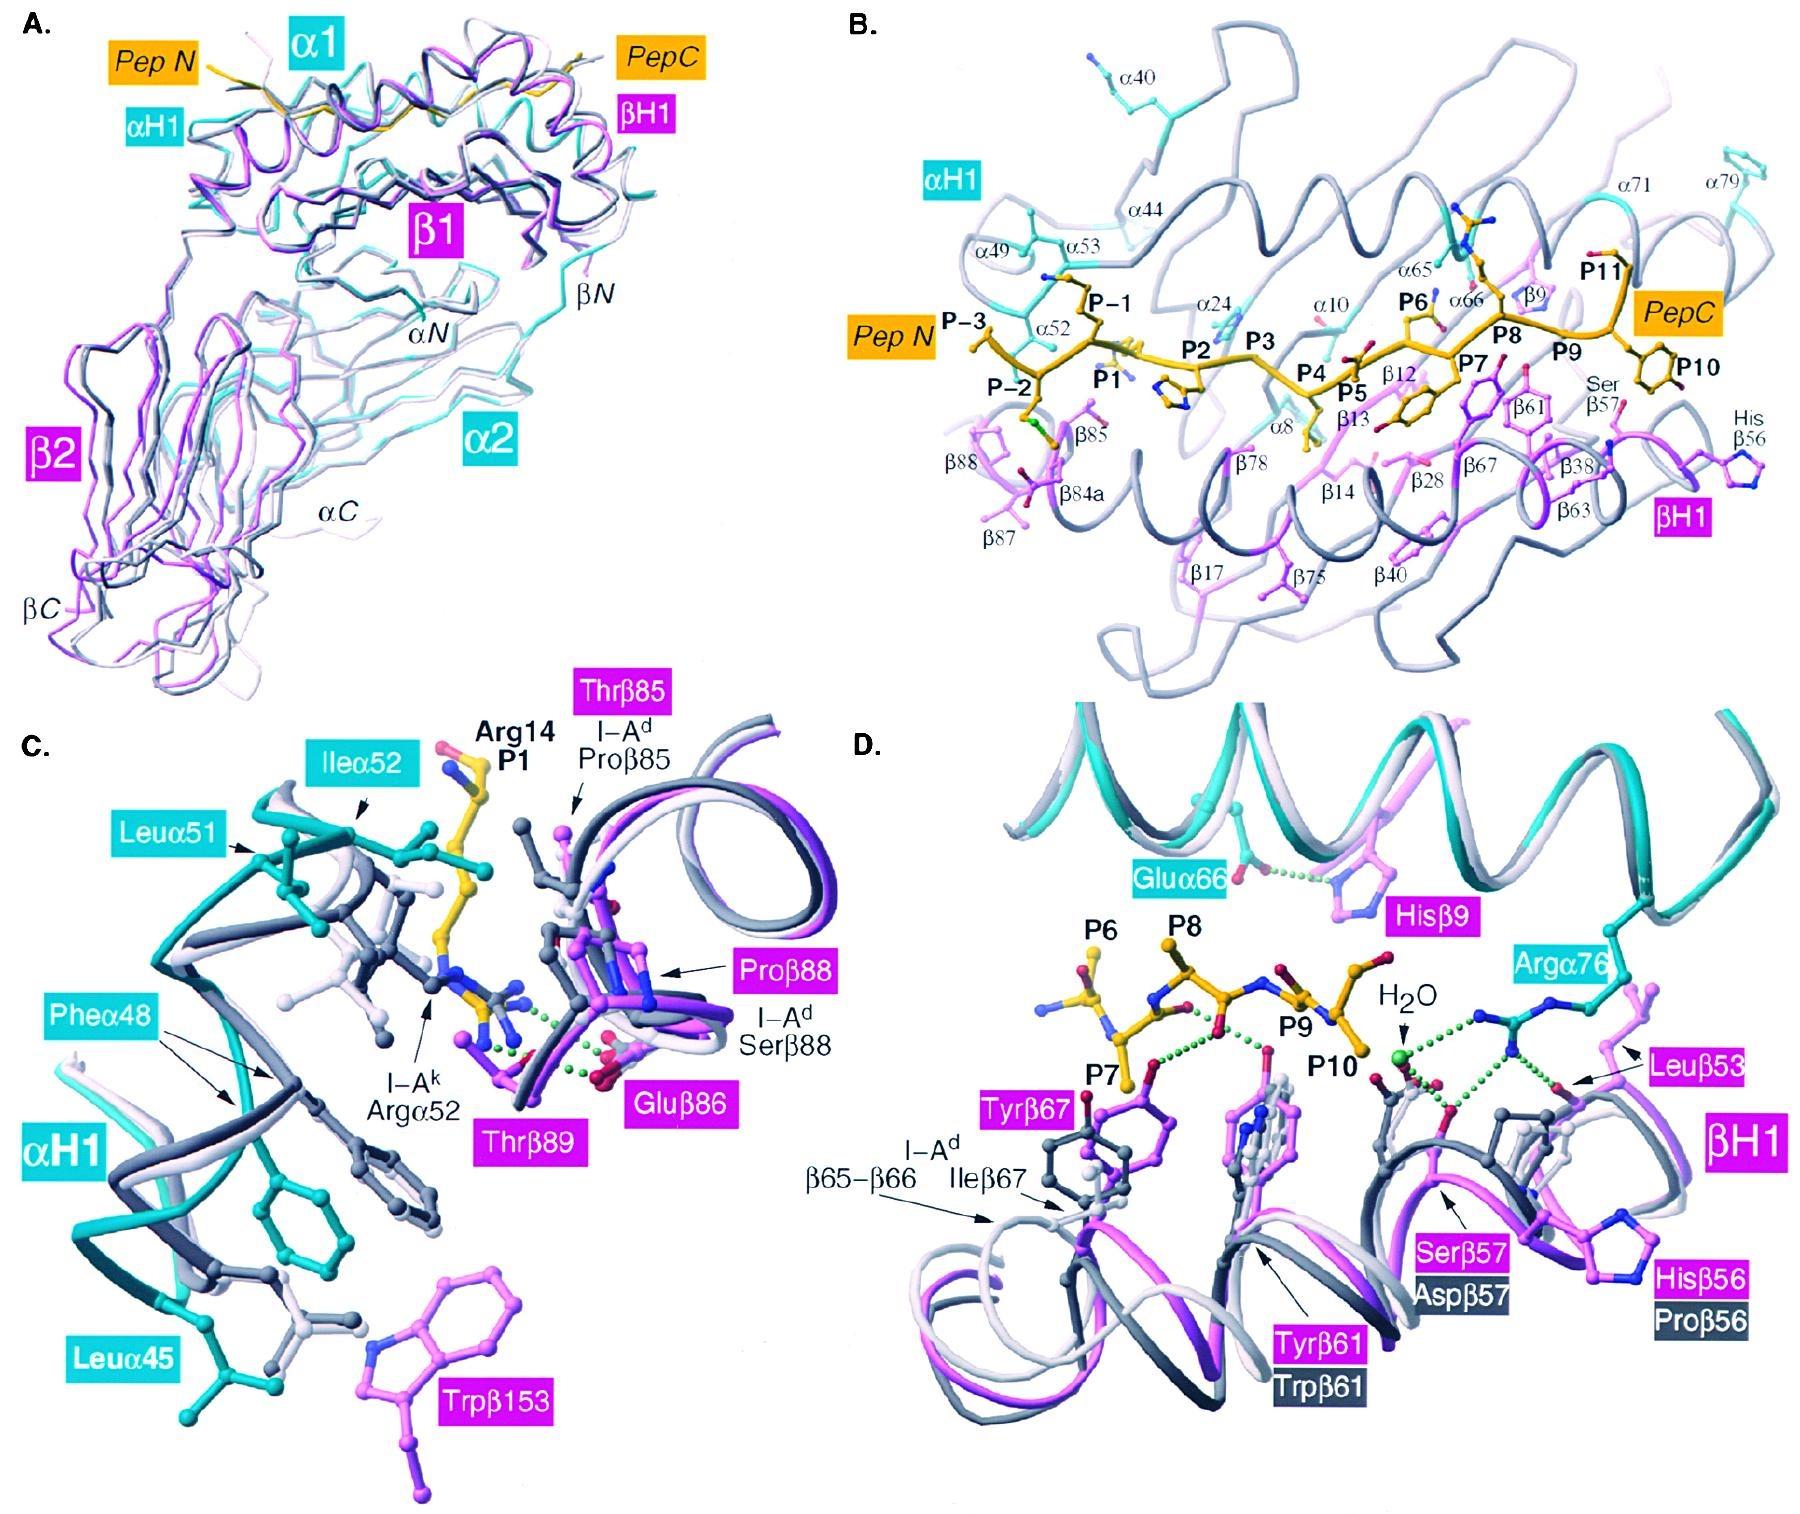 I Ag7 Structure Comparison(A) Comparison Of I Ag7 (α Chain